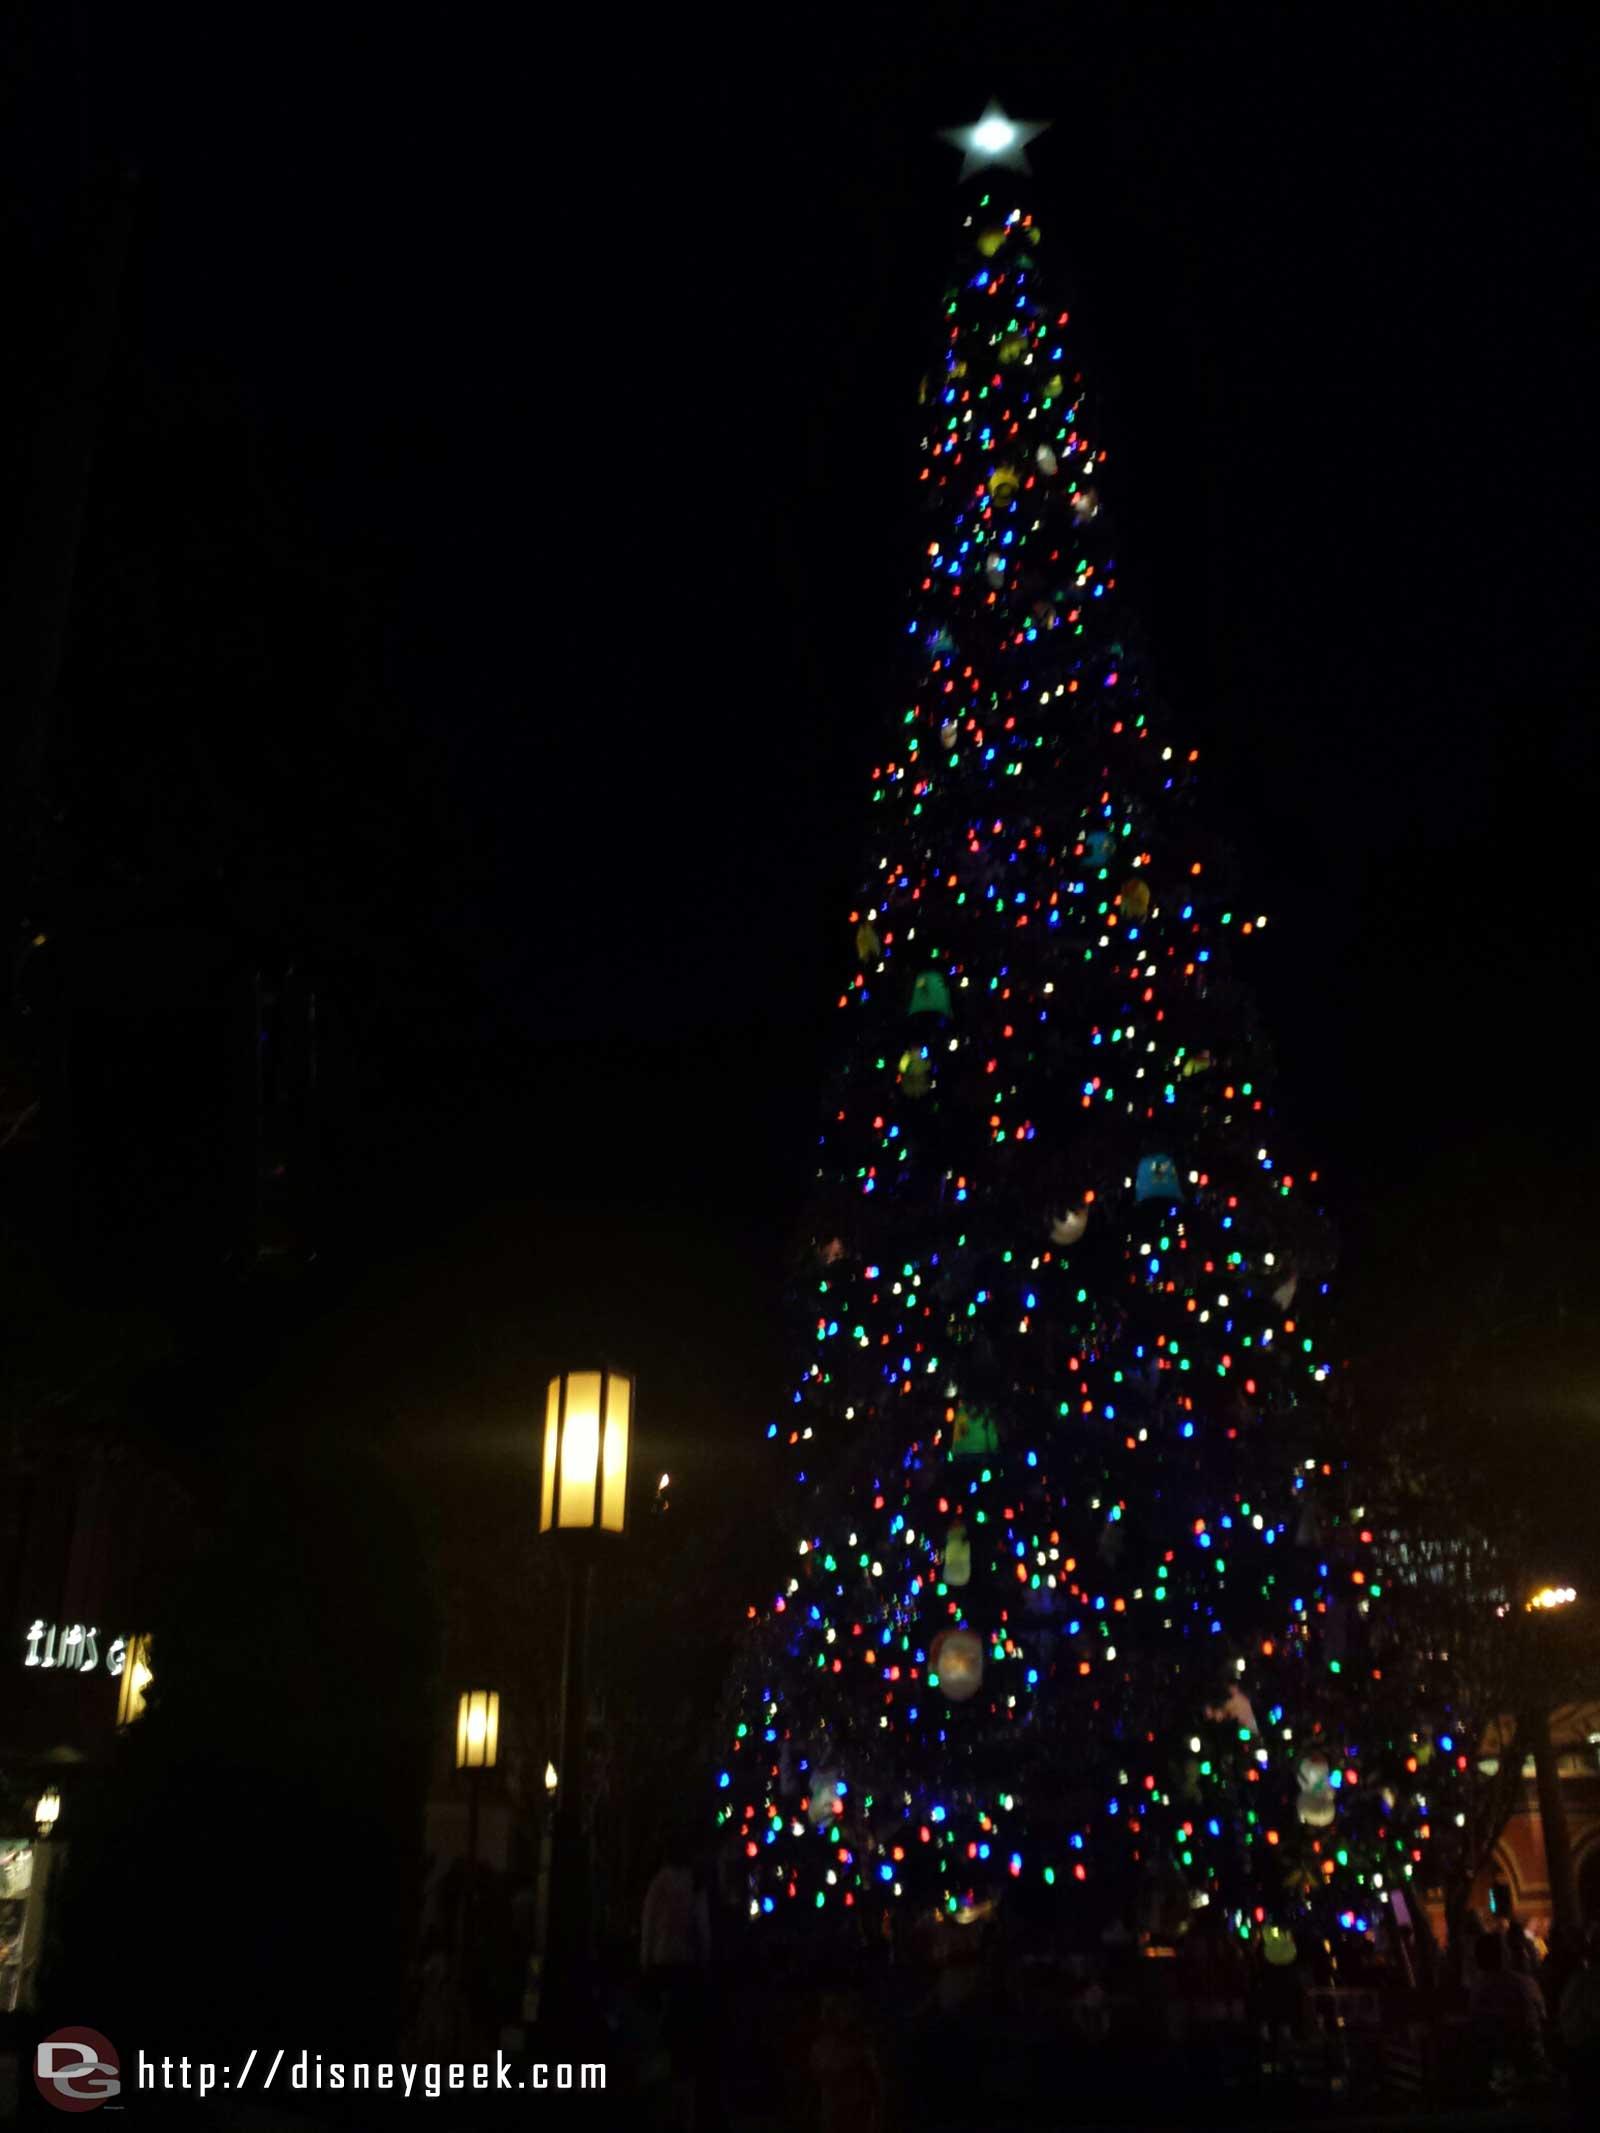 The #BuenaVistaStreet Christmas tree lit up